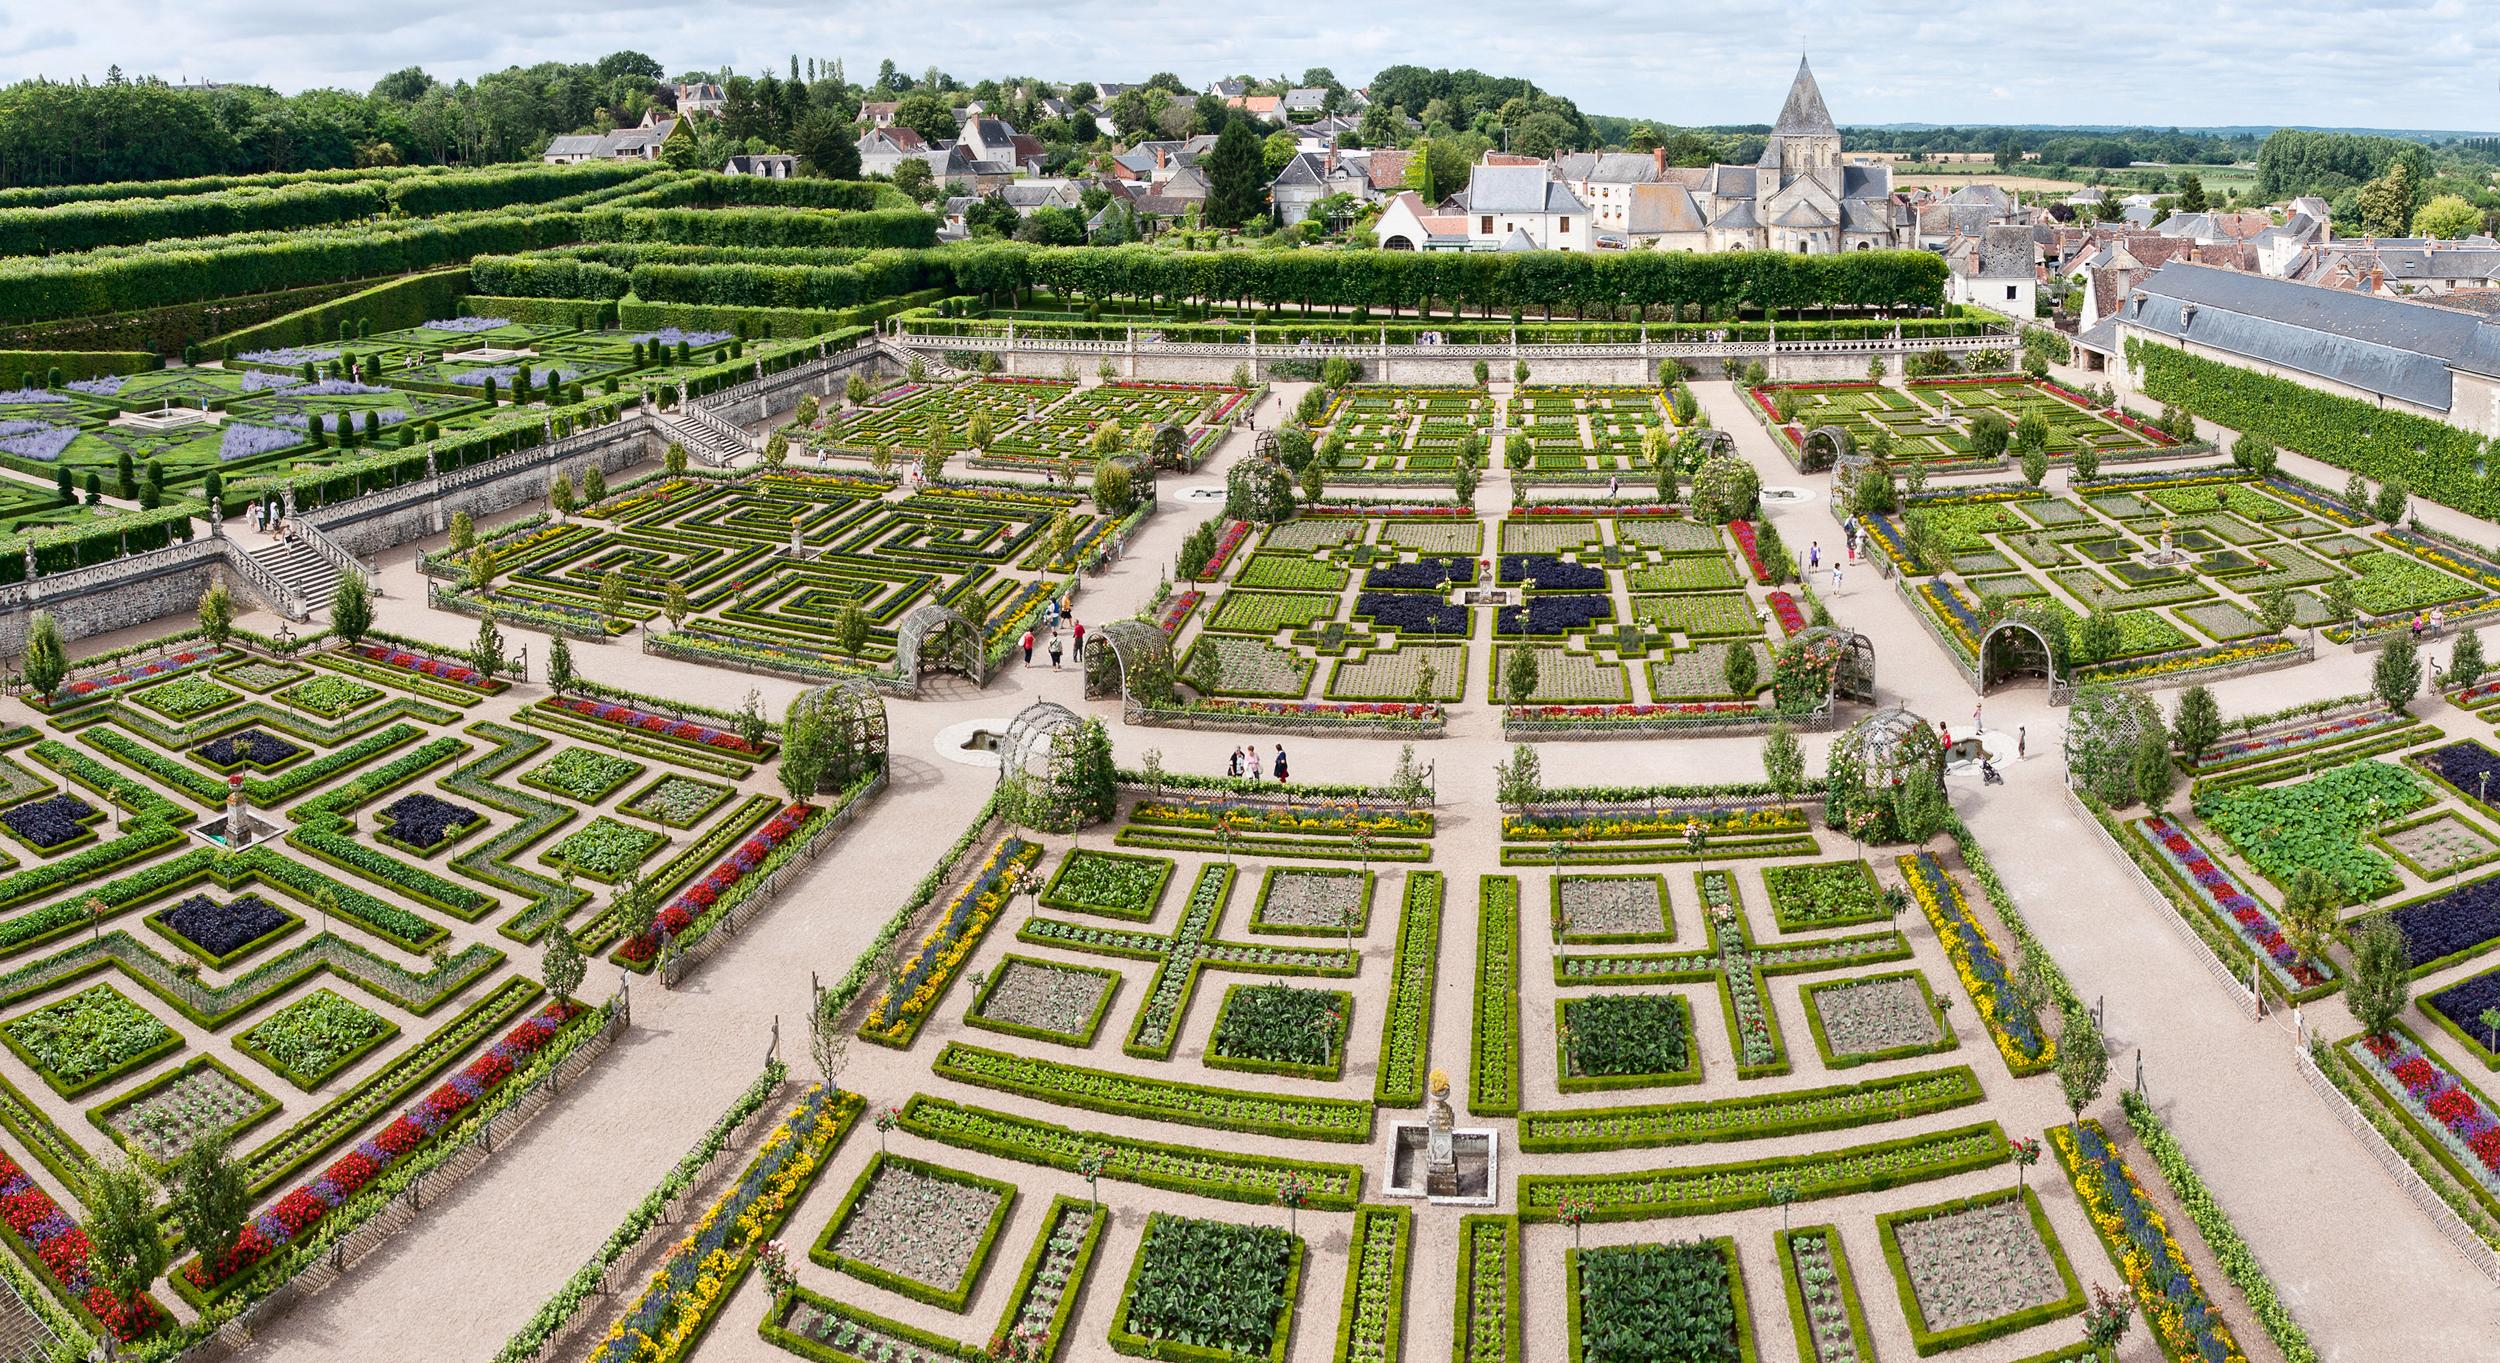 Vista panorâmica do jardim do Château Villandry, no Vale do Loire, França